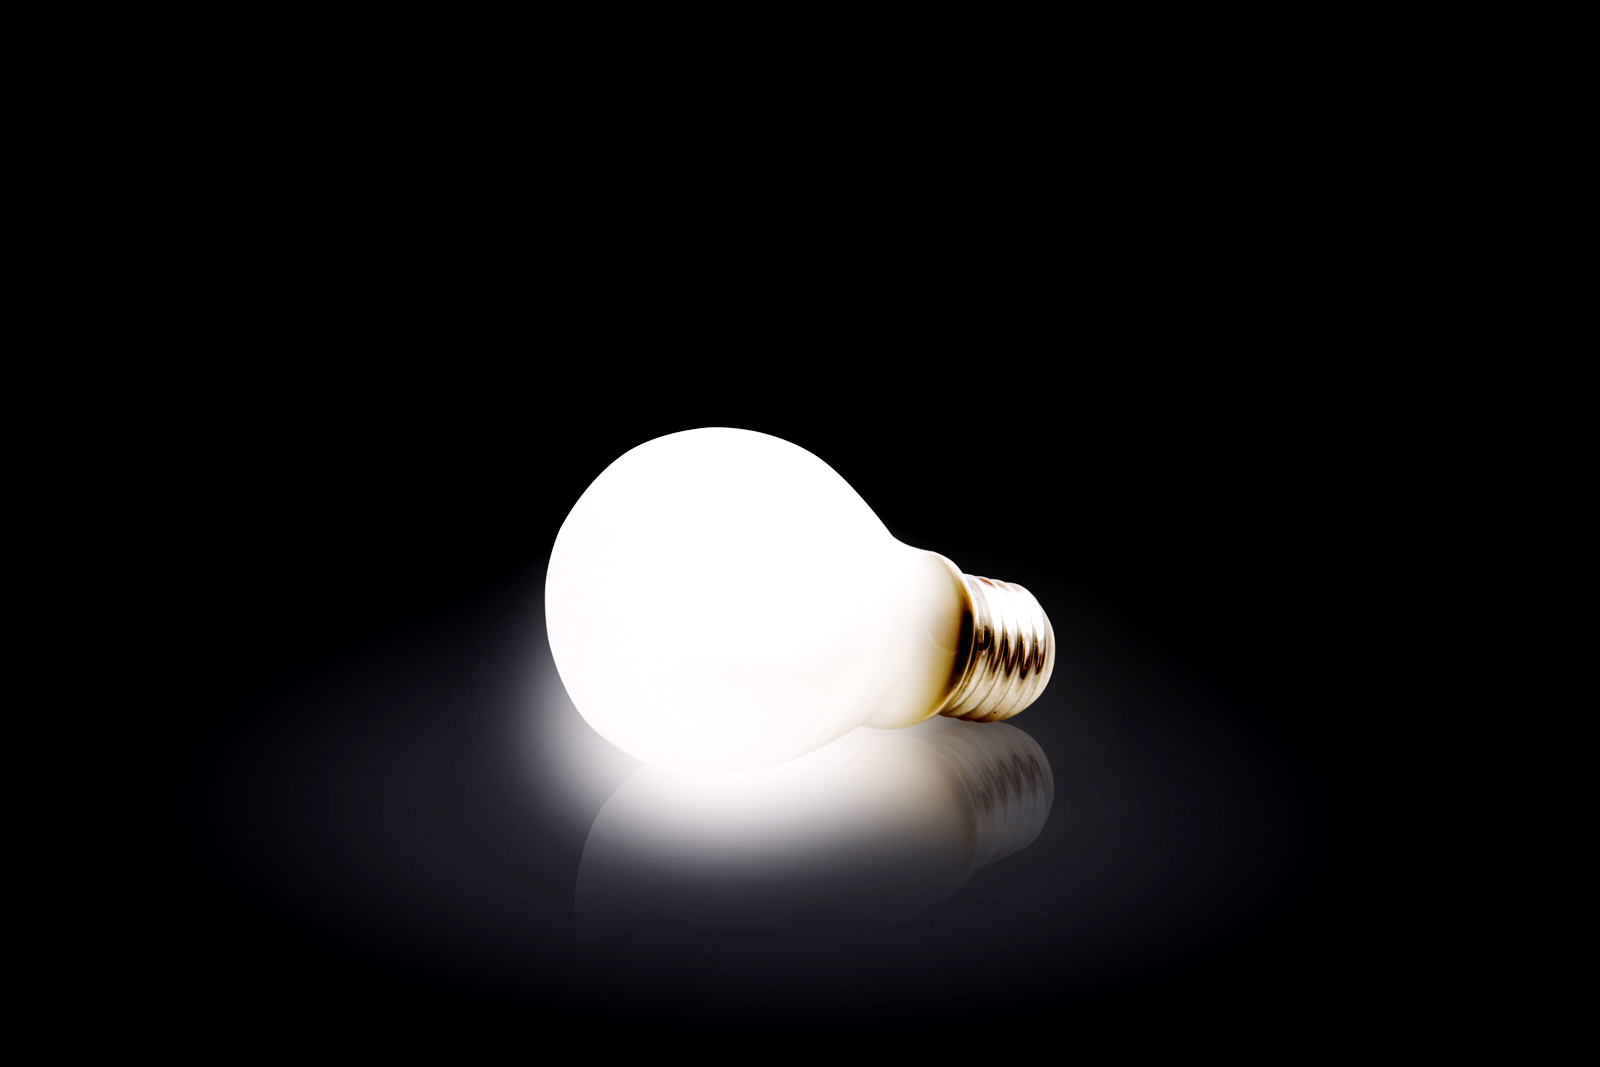 Light Bulb Hd Wallpapers Stock Photos Hd Wallpapers